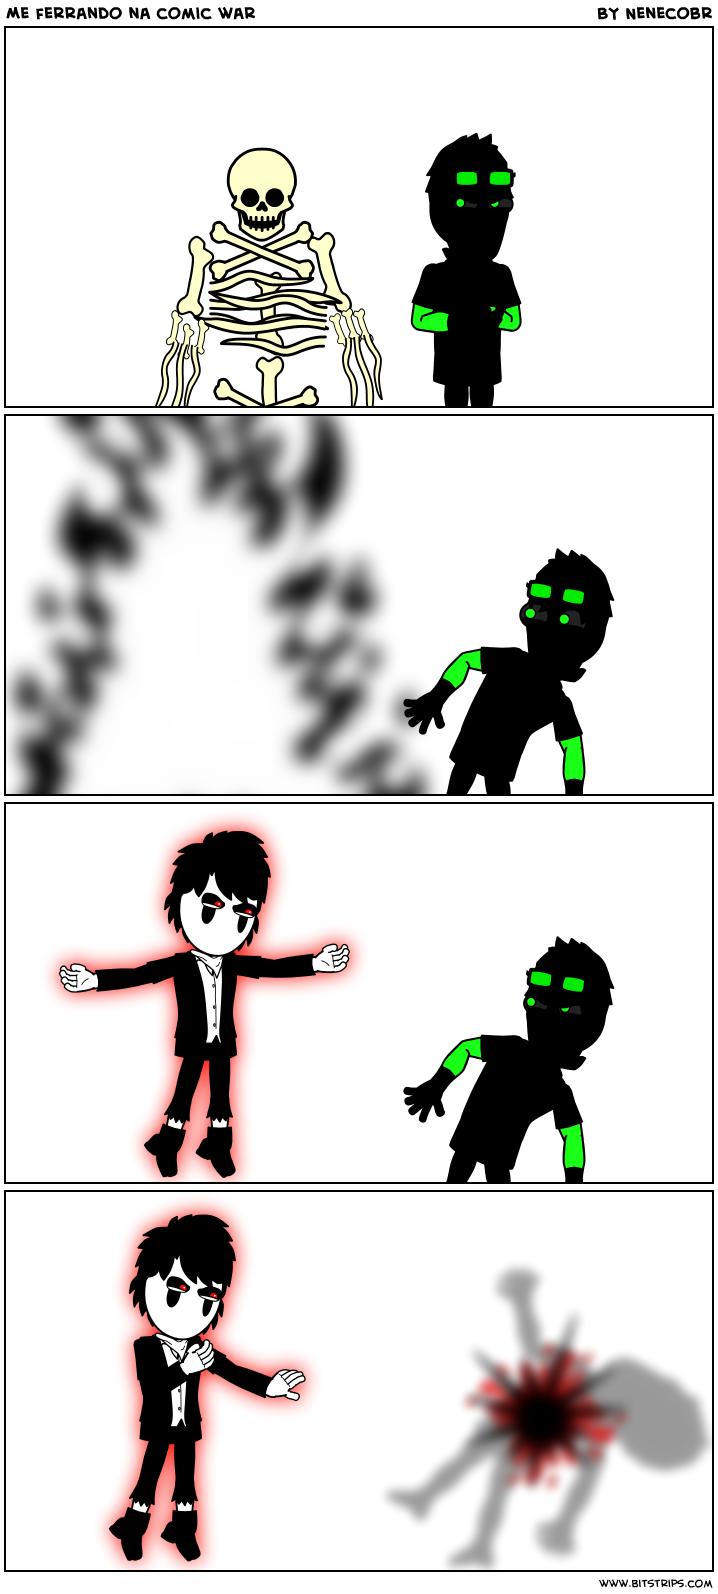 Me ferrando na comic war